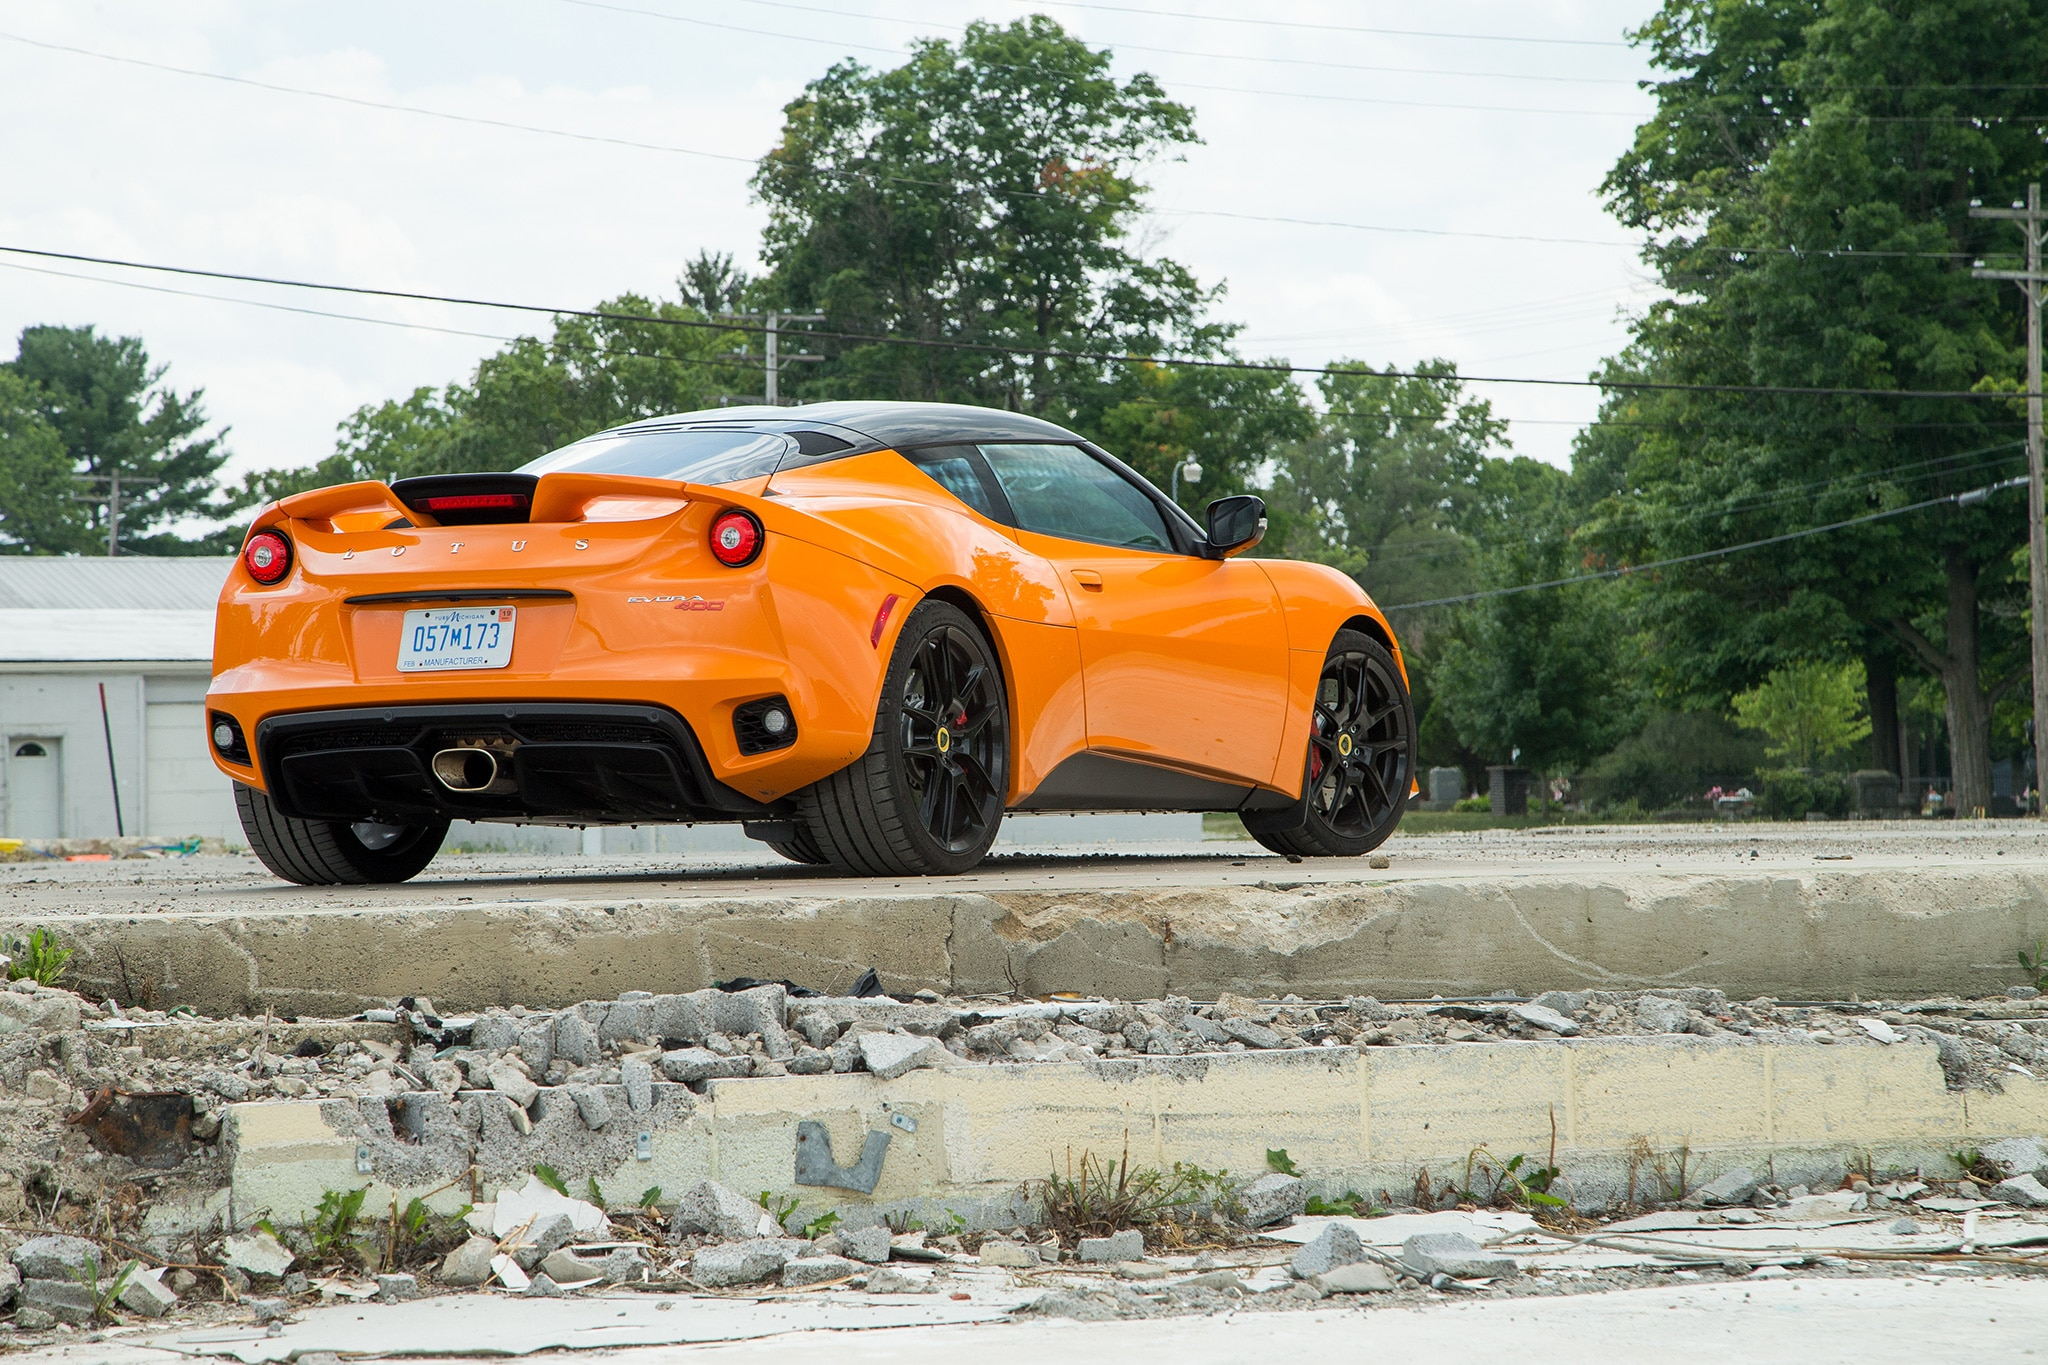 2017 Lotus Evora 400 Rear Three Quarter 04